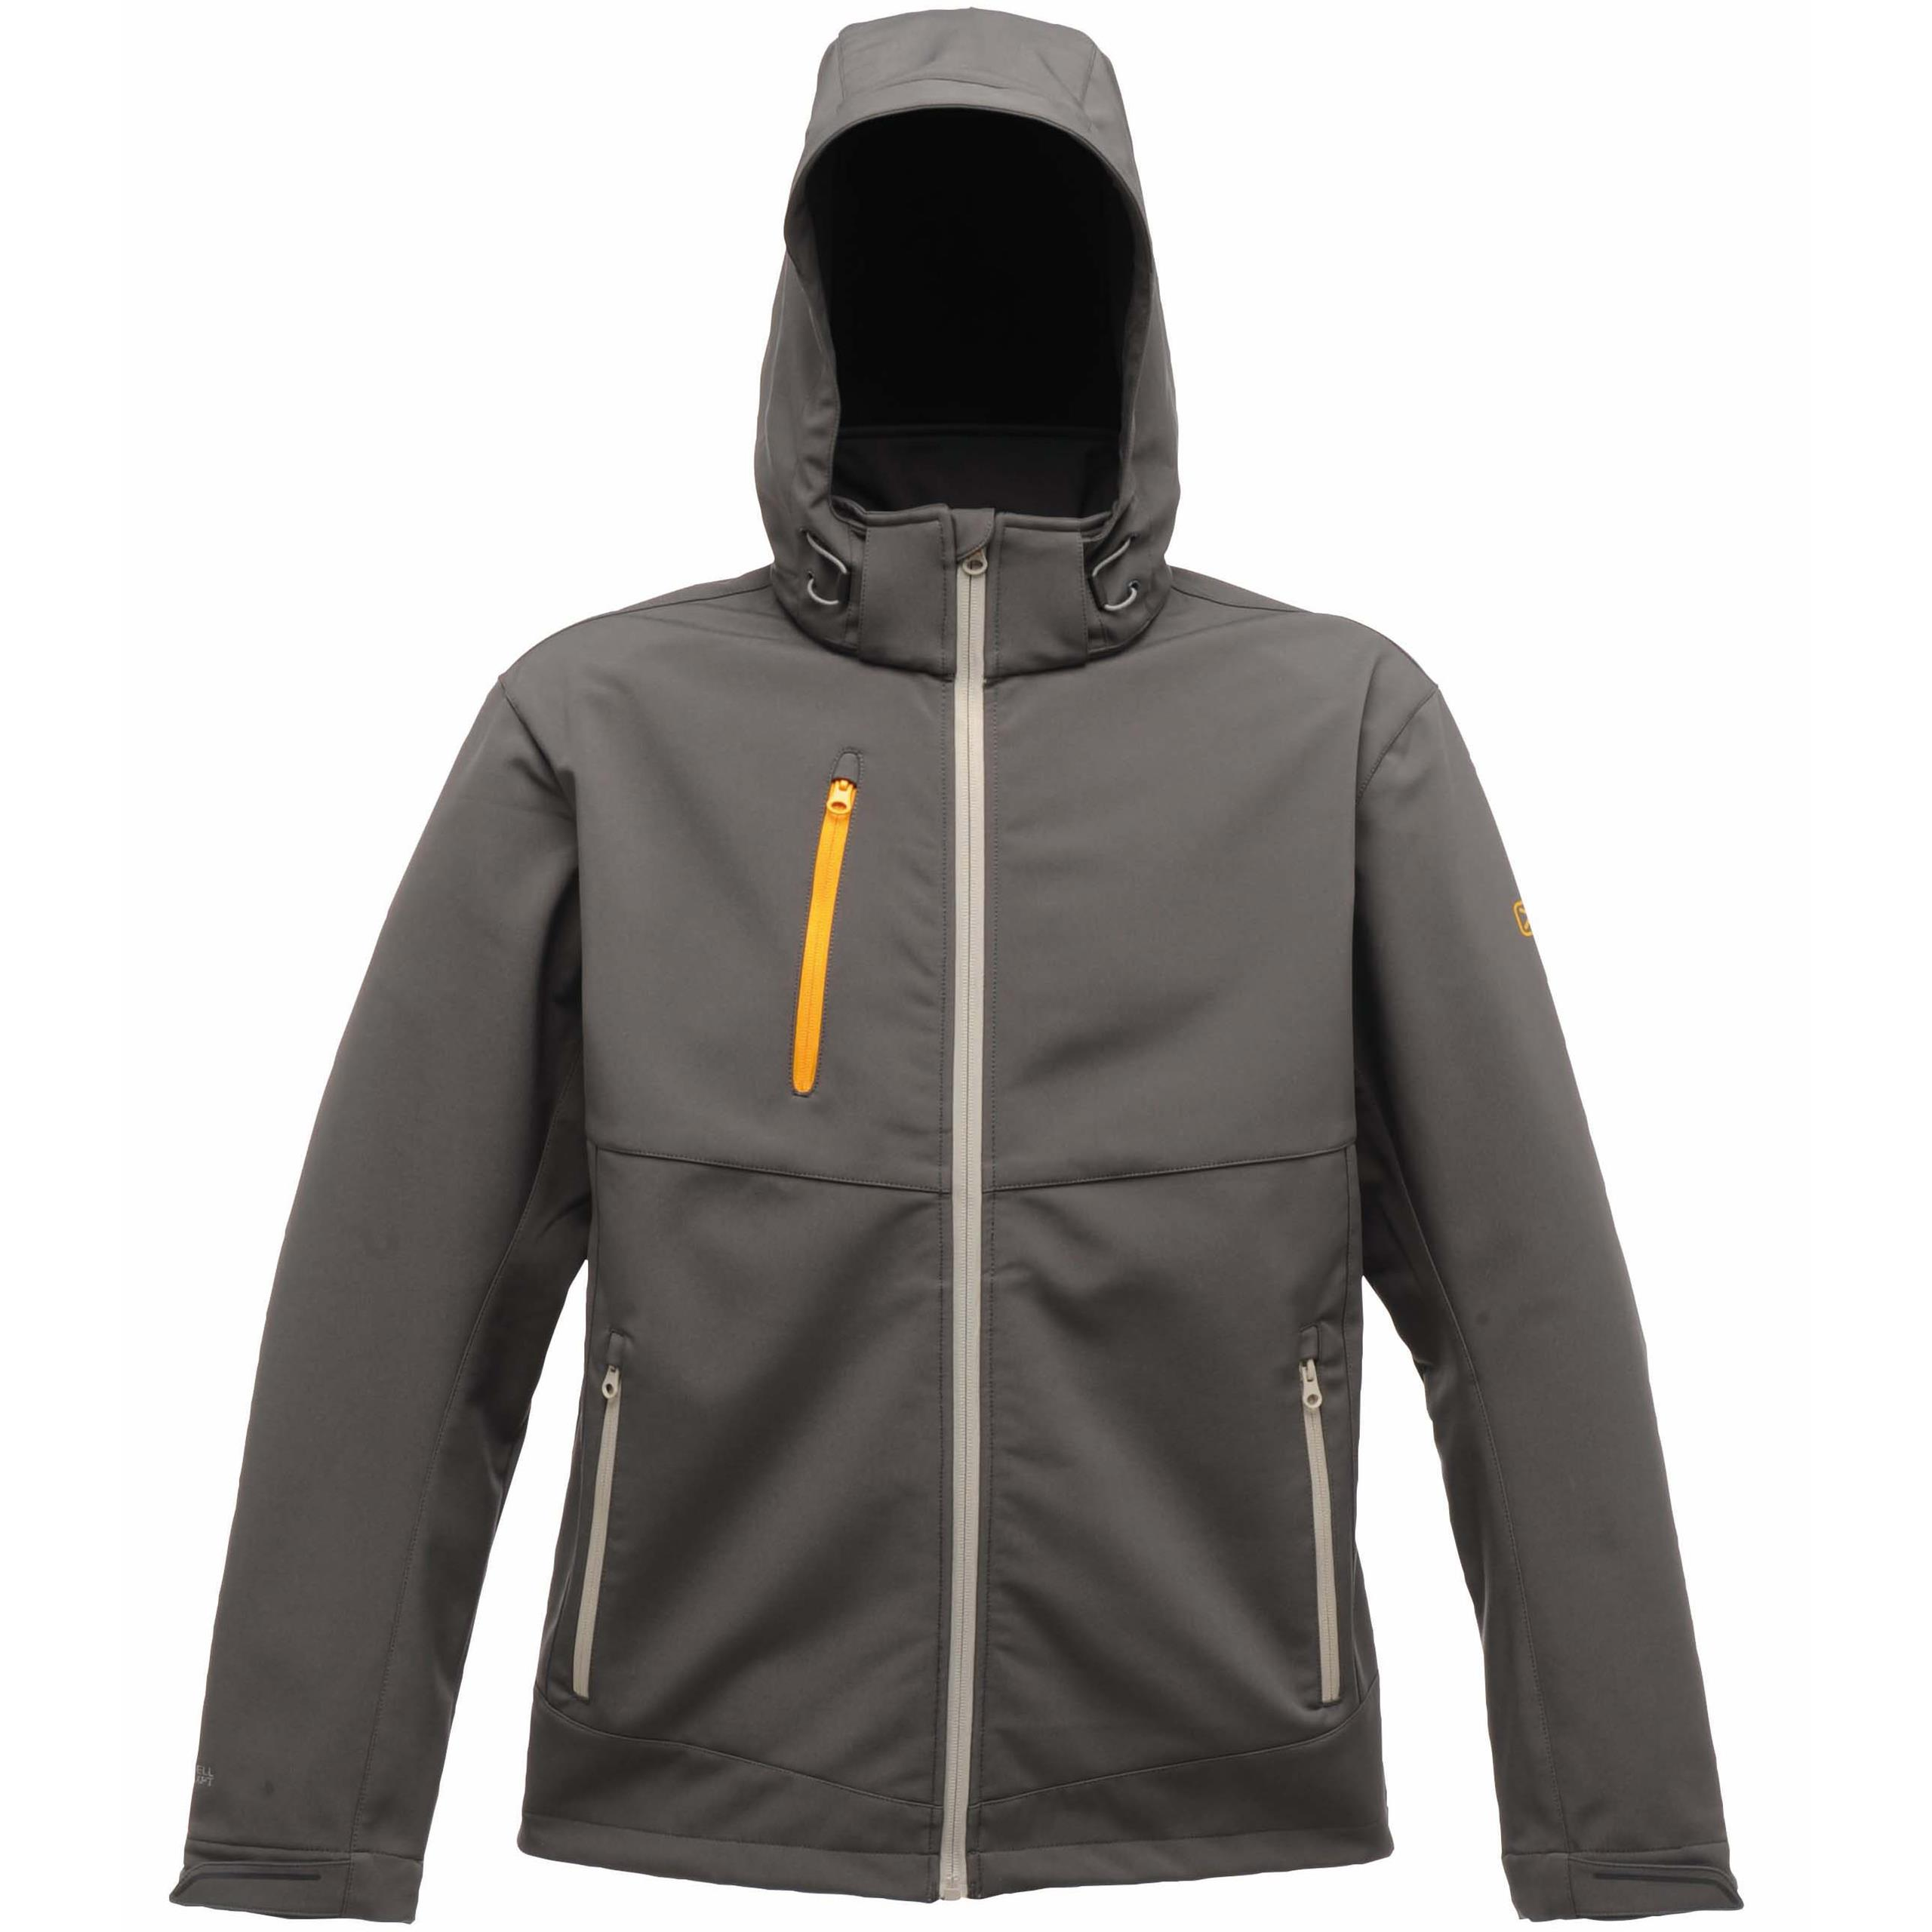 Mens regatta jacket - New Mens Regatta Durable Wind Resistant 3 Layered